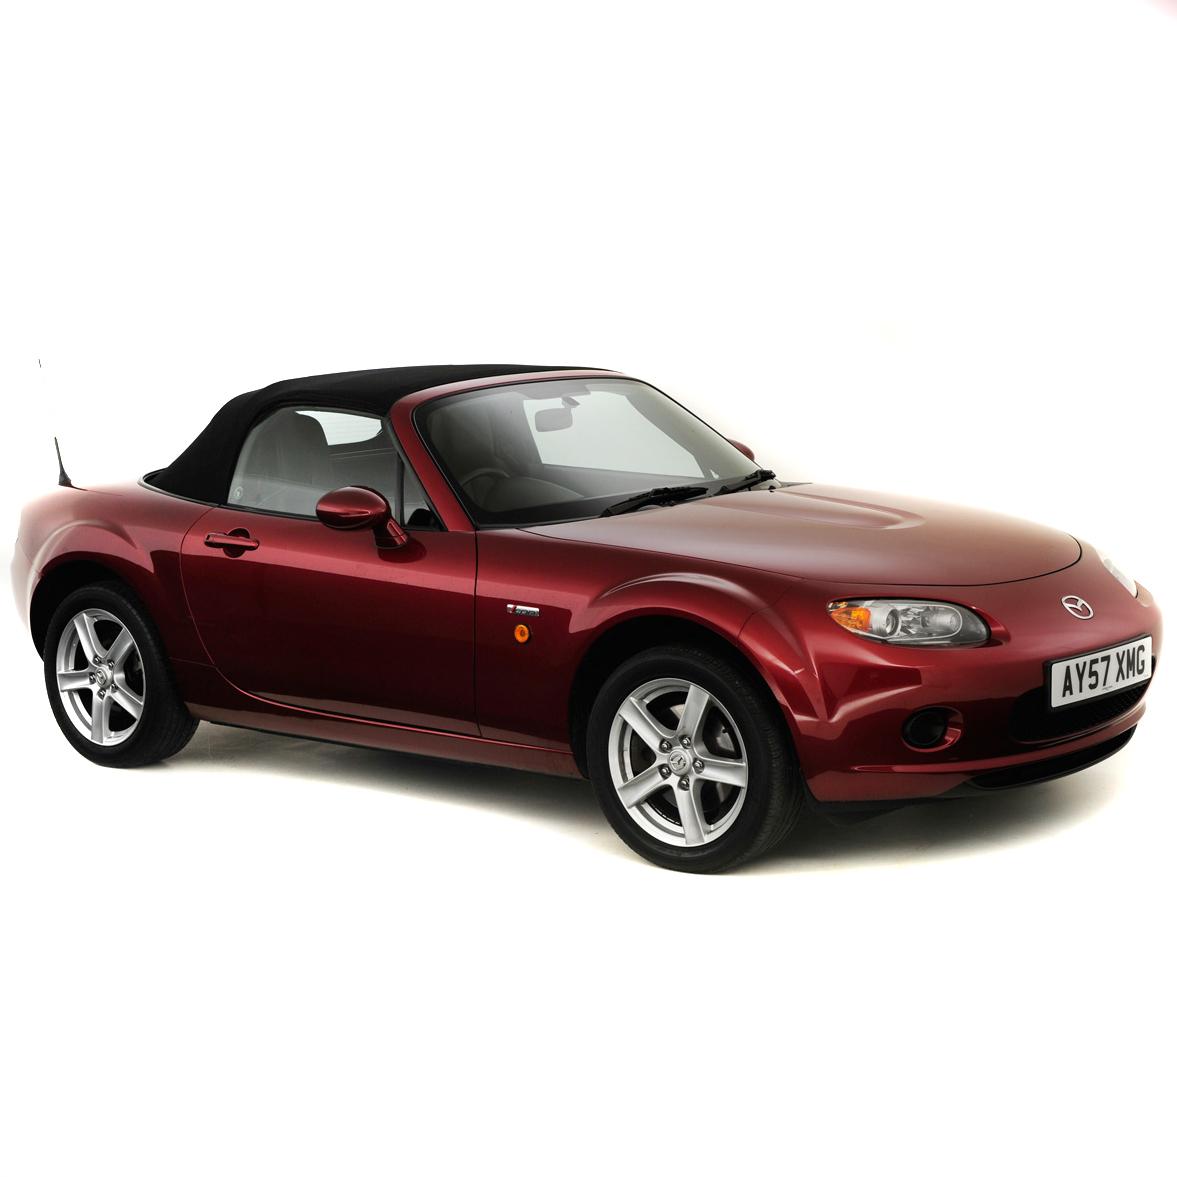 Mazda MX 5 (3rd gen) 2005-2007